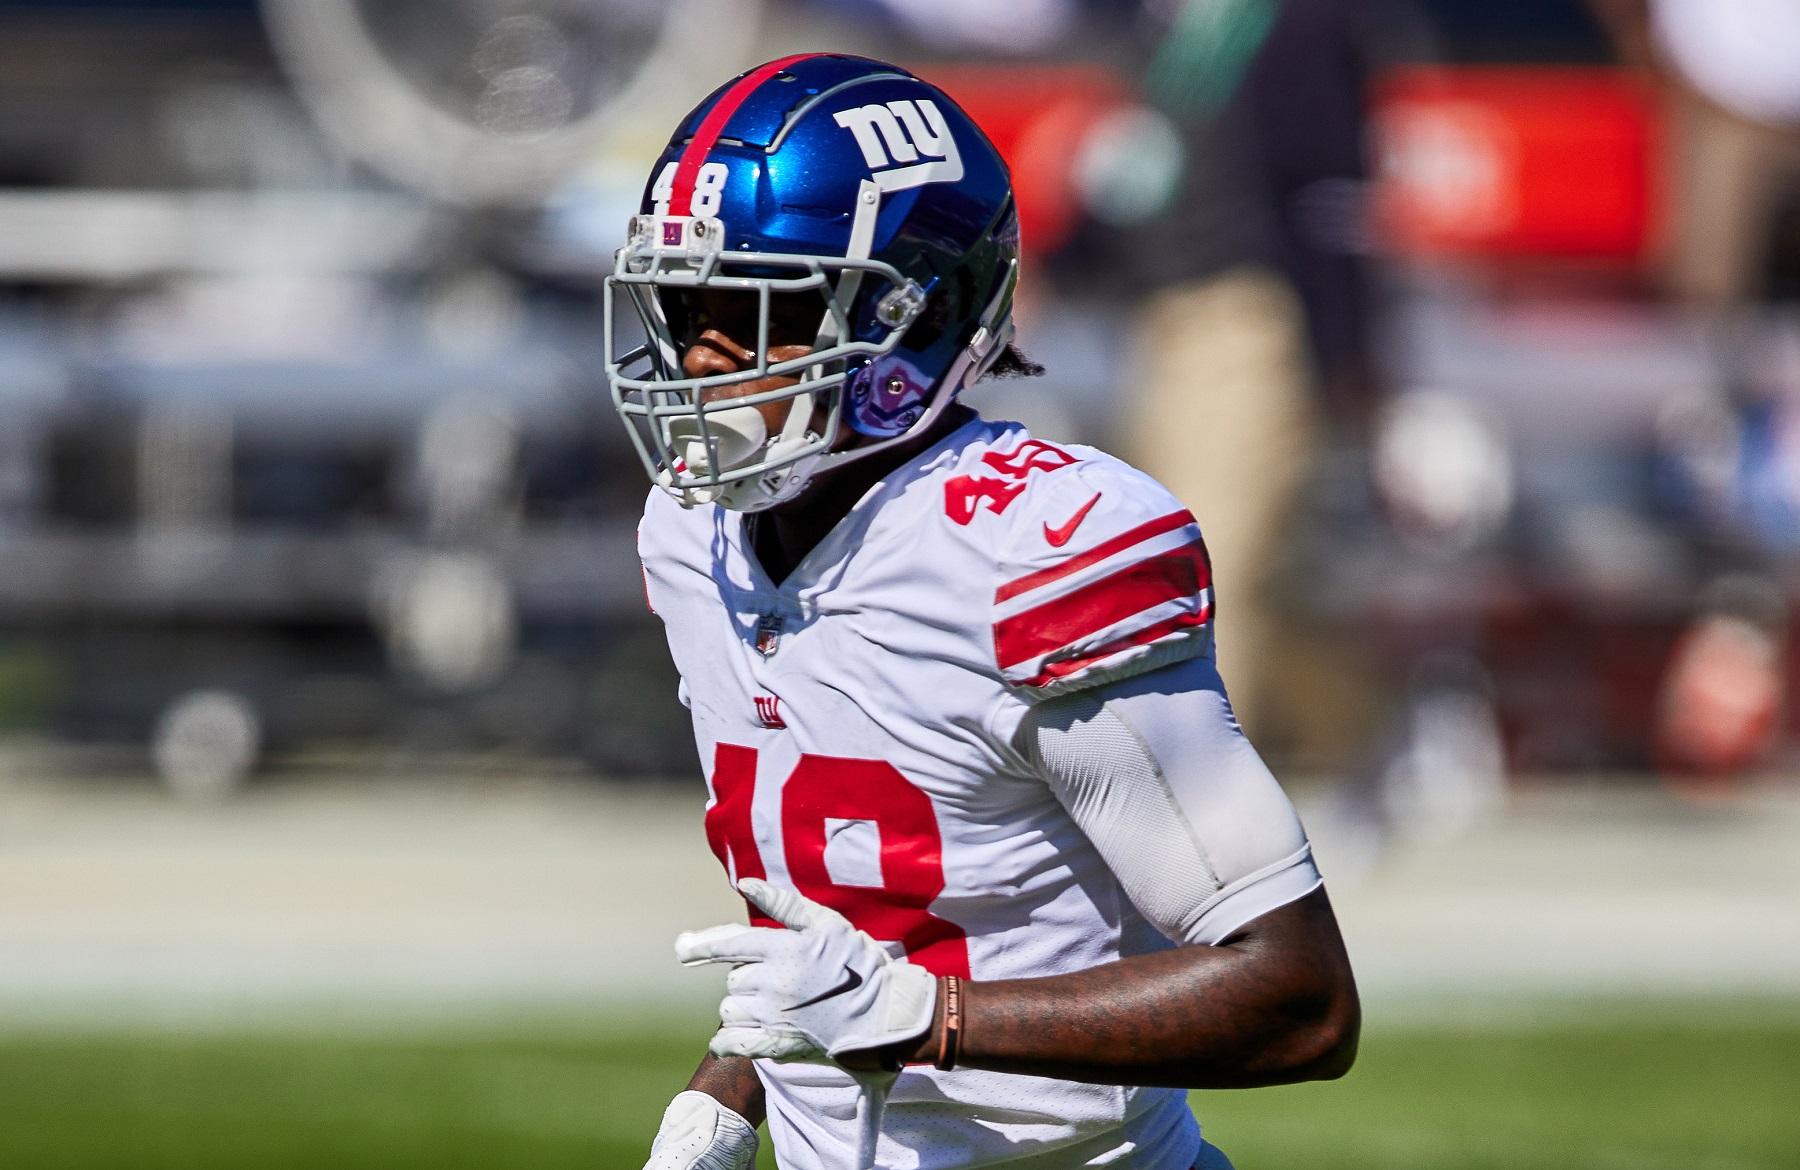 Tae Crowder, New York Giants